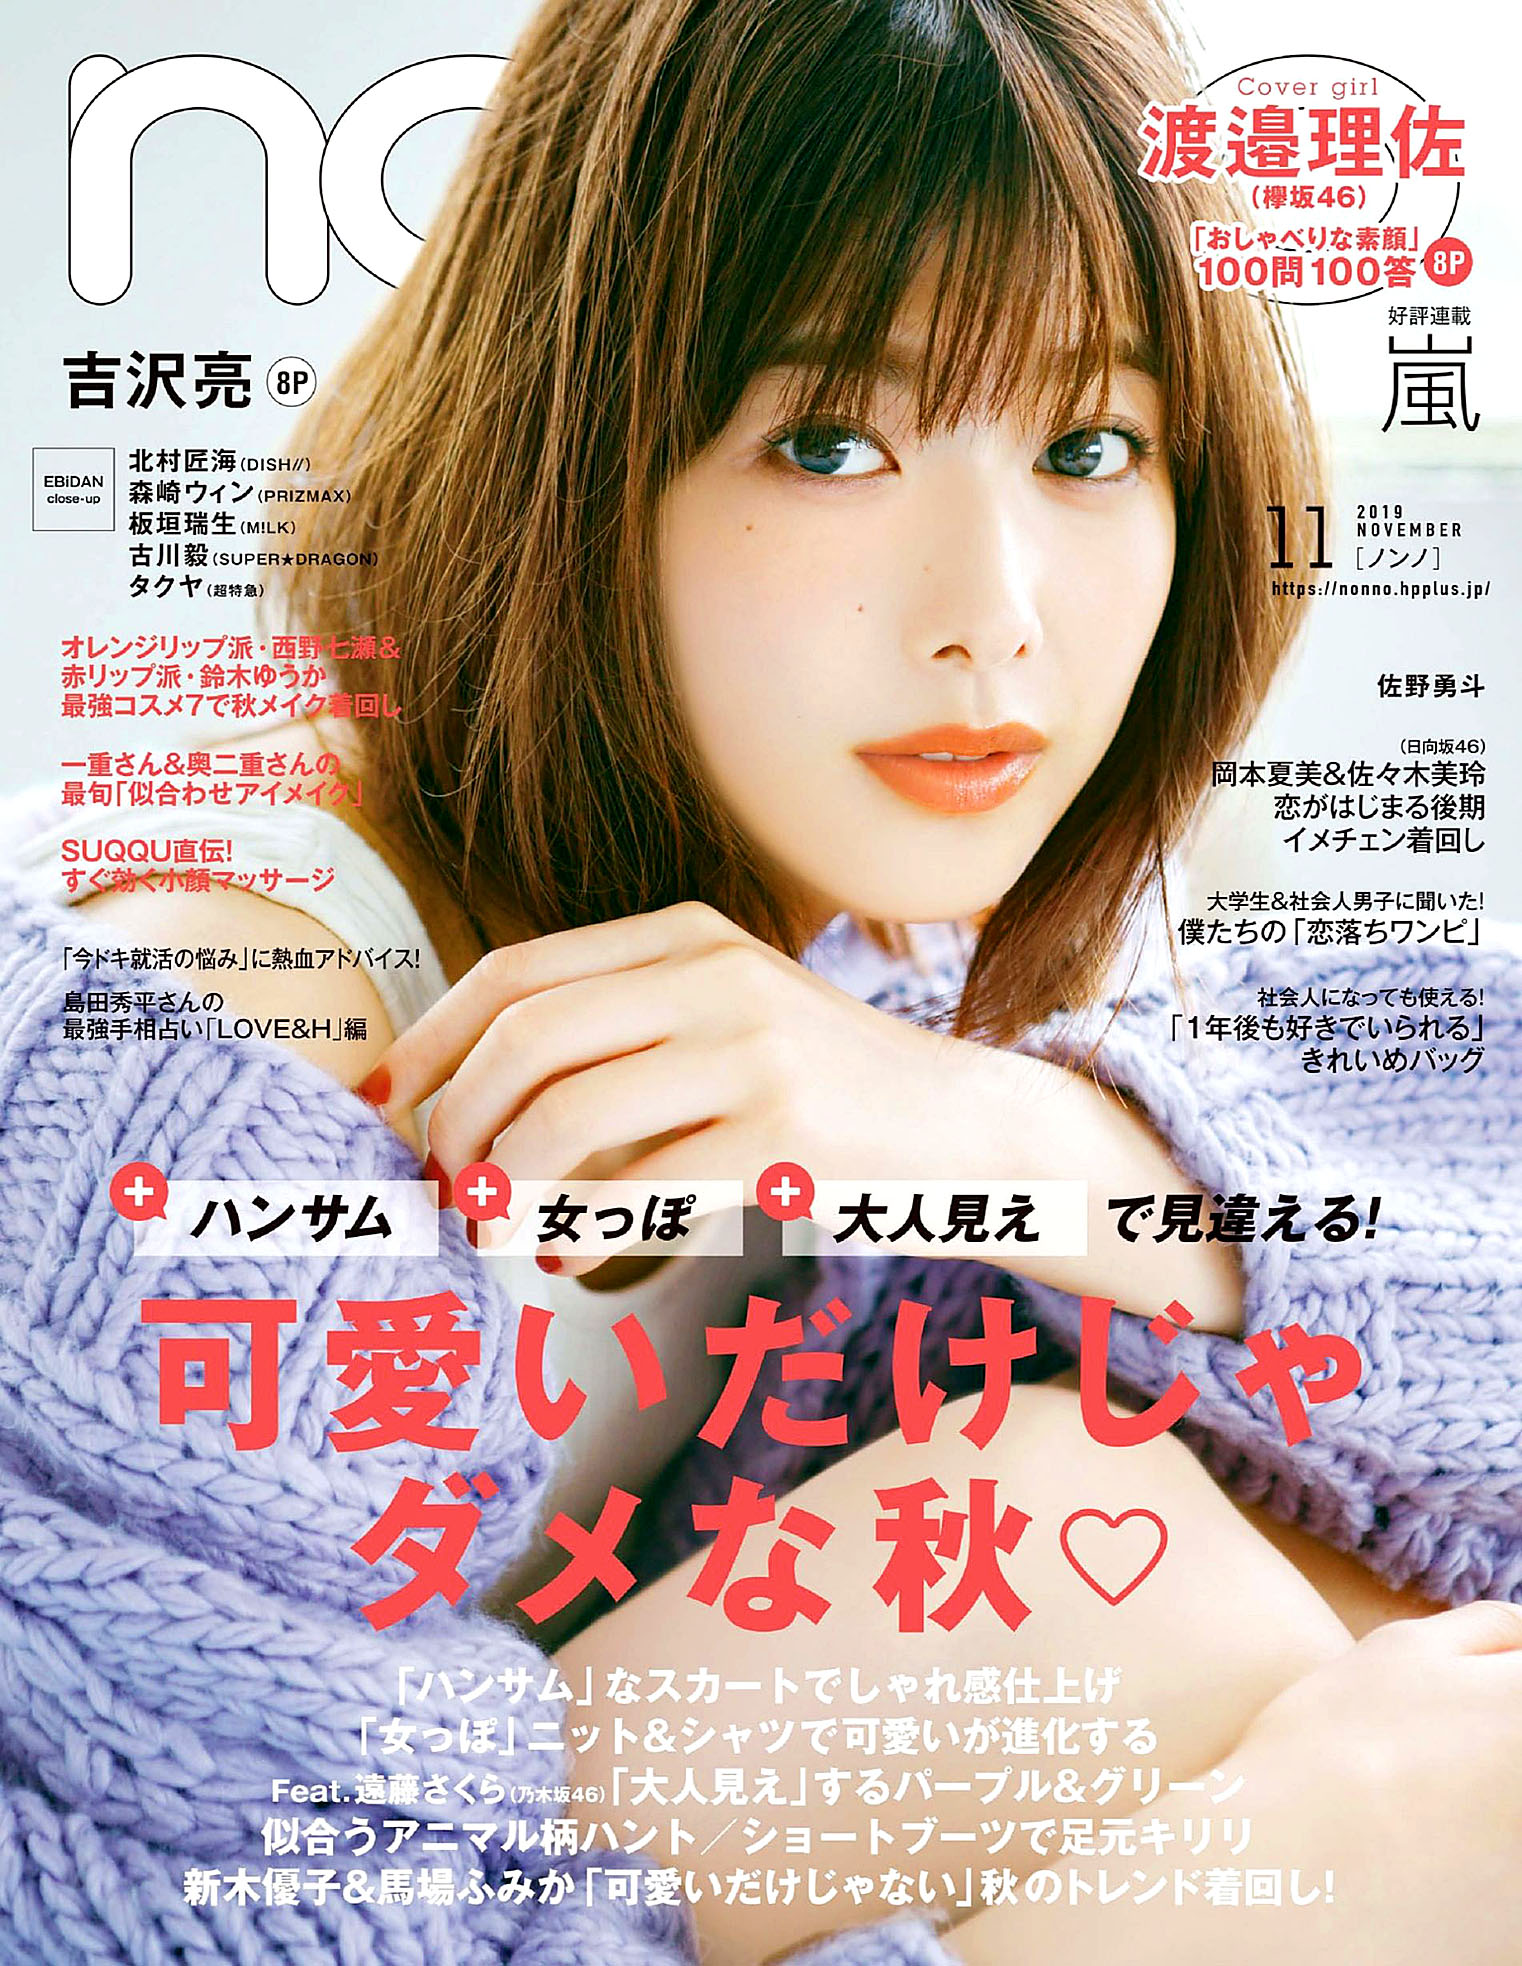 Risa Watanabe K46 NonNo 1911.jpg